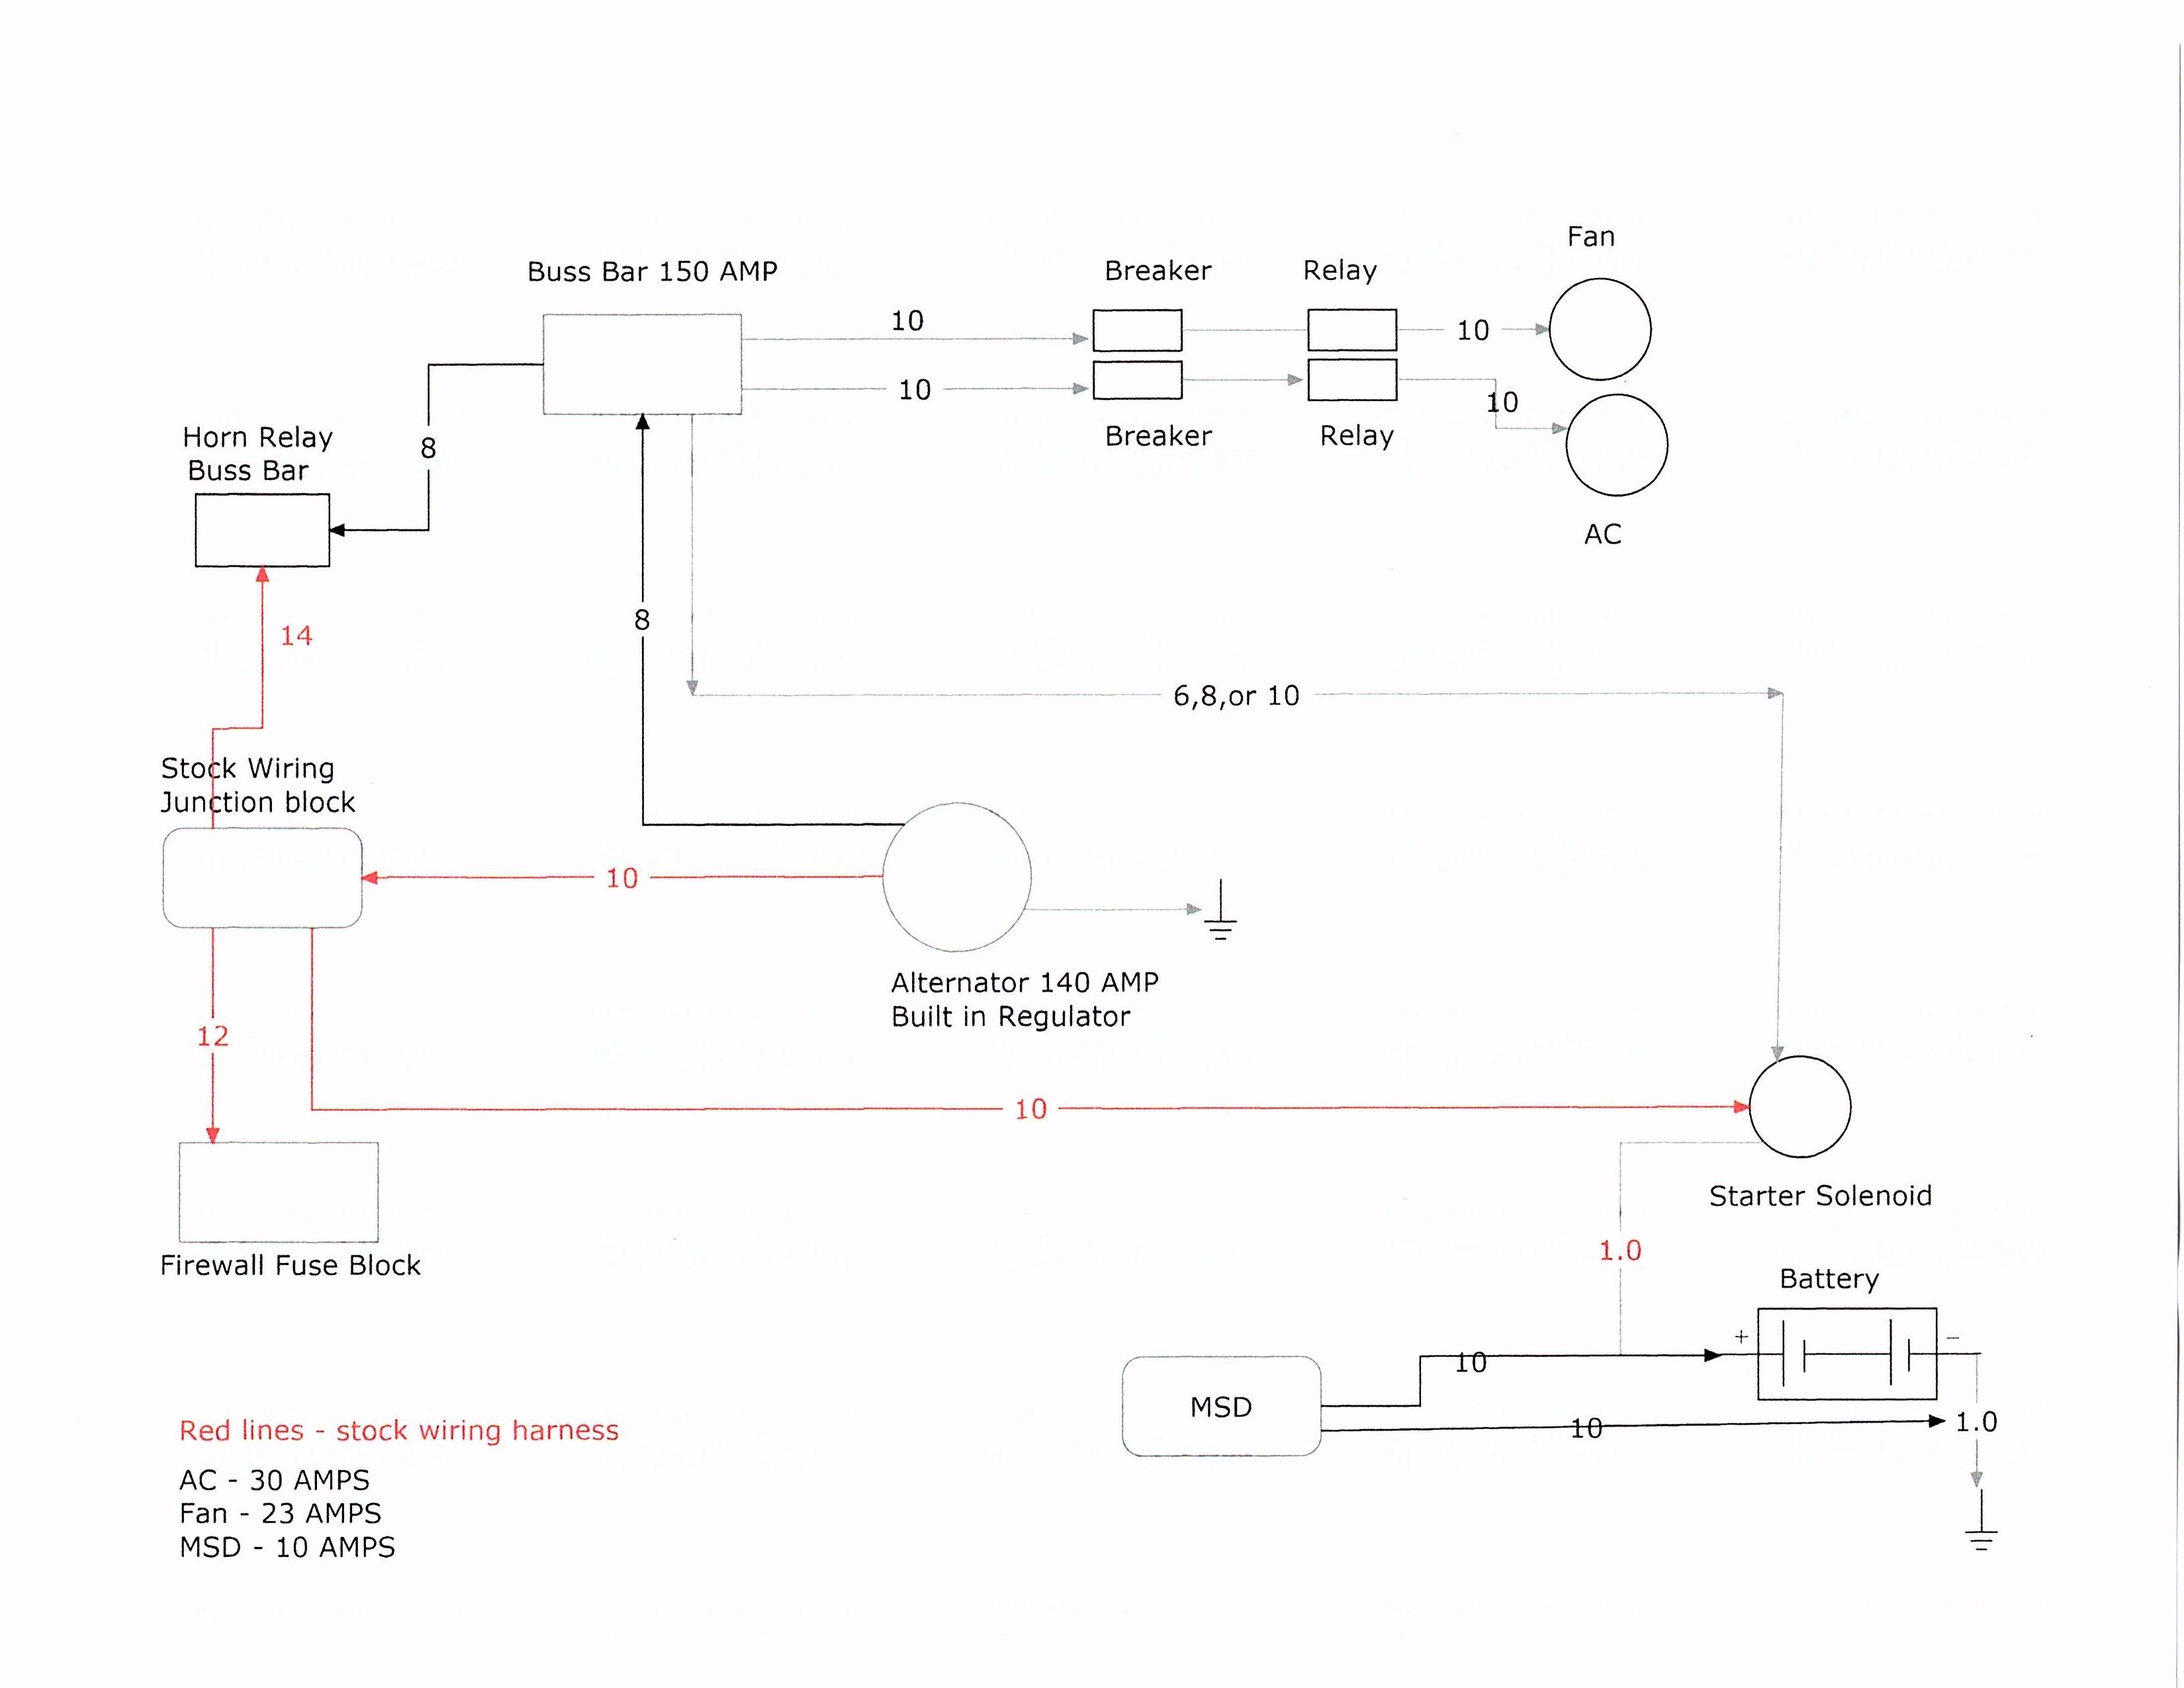 ford alternator wiring diagram ford image wiring s i1 wp com corvetteforum com forums att on ford alternator wiring diagram